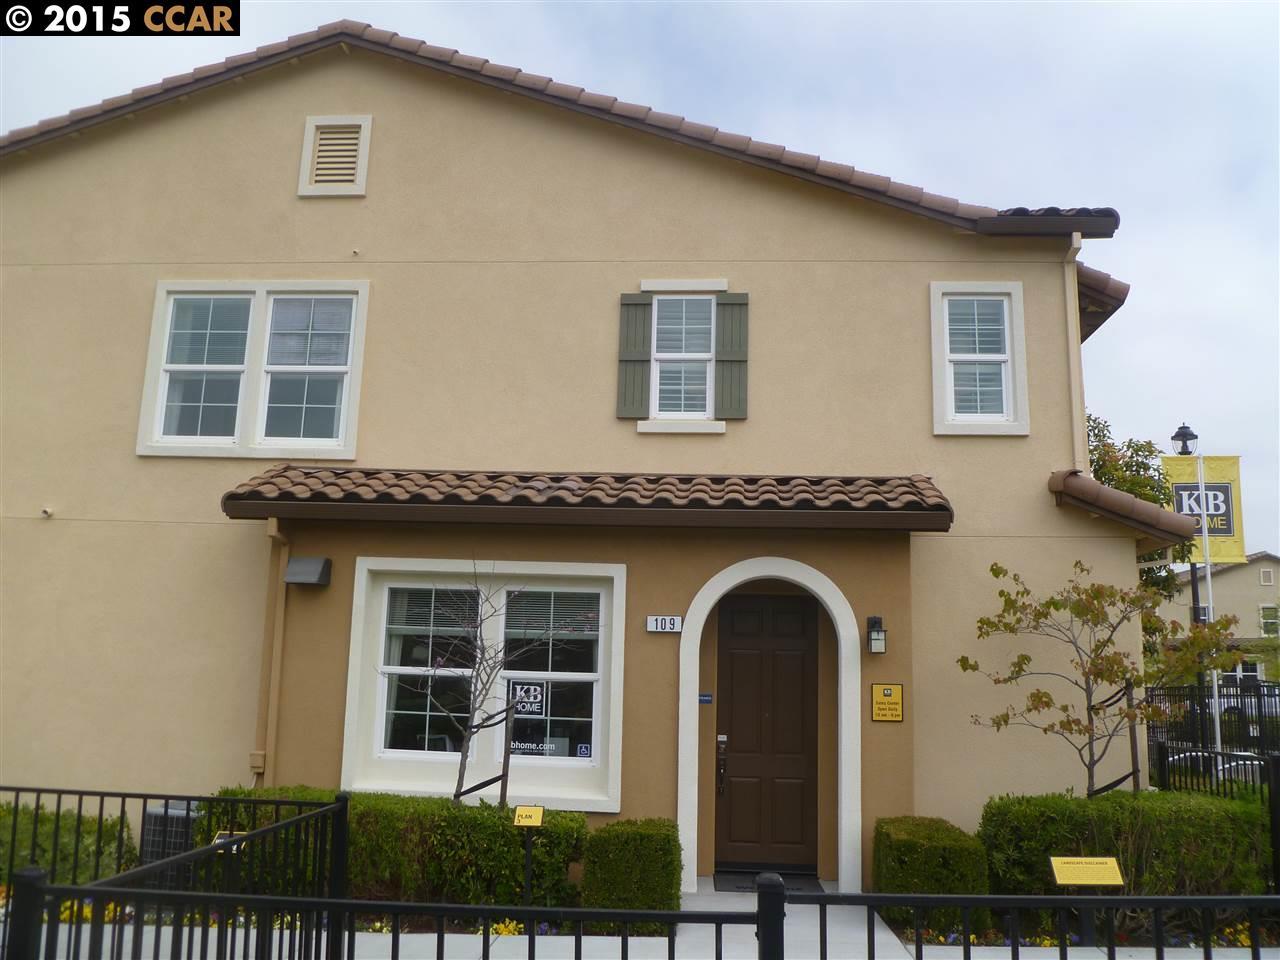 109 Padua St, San Pablo, CA 94806